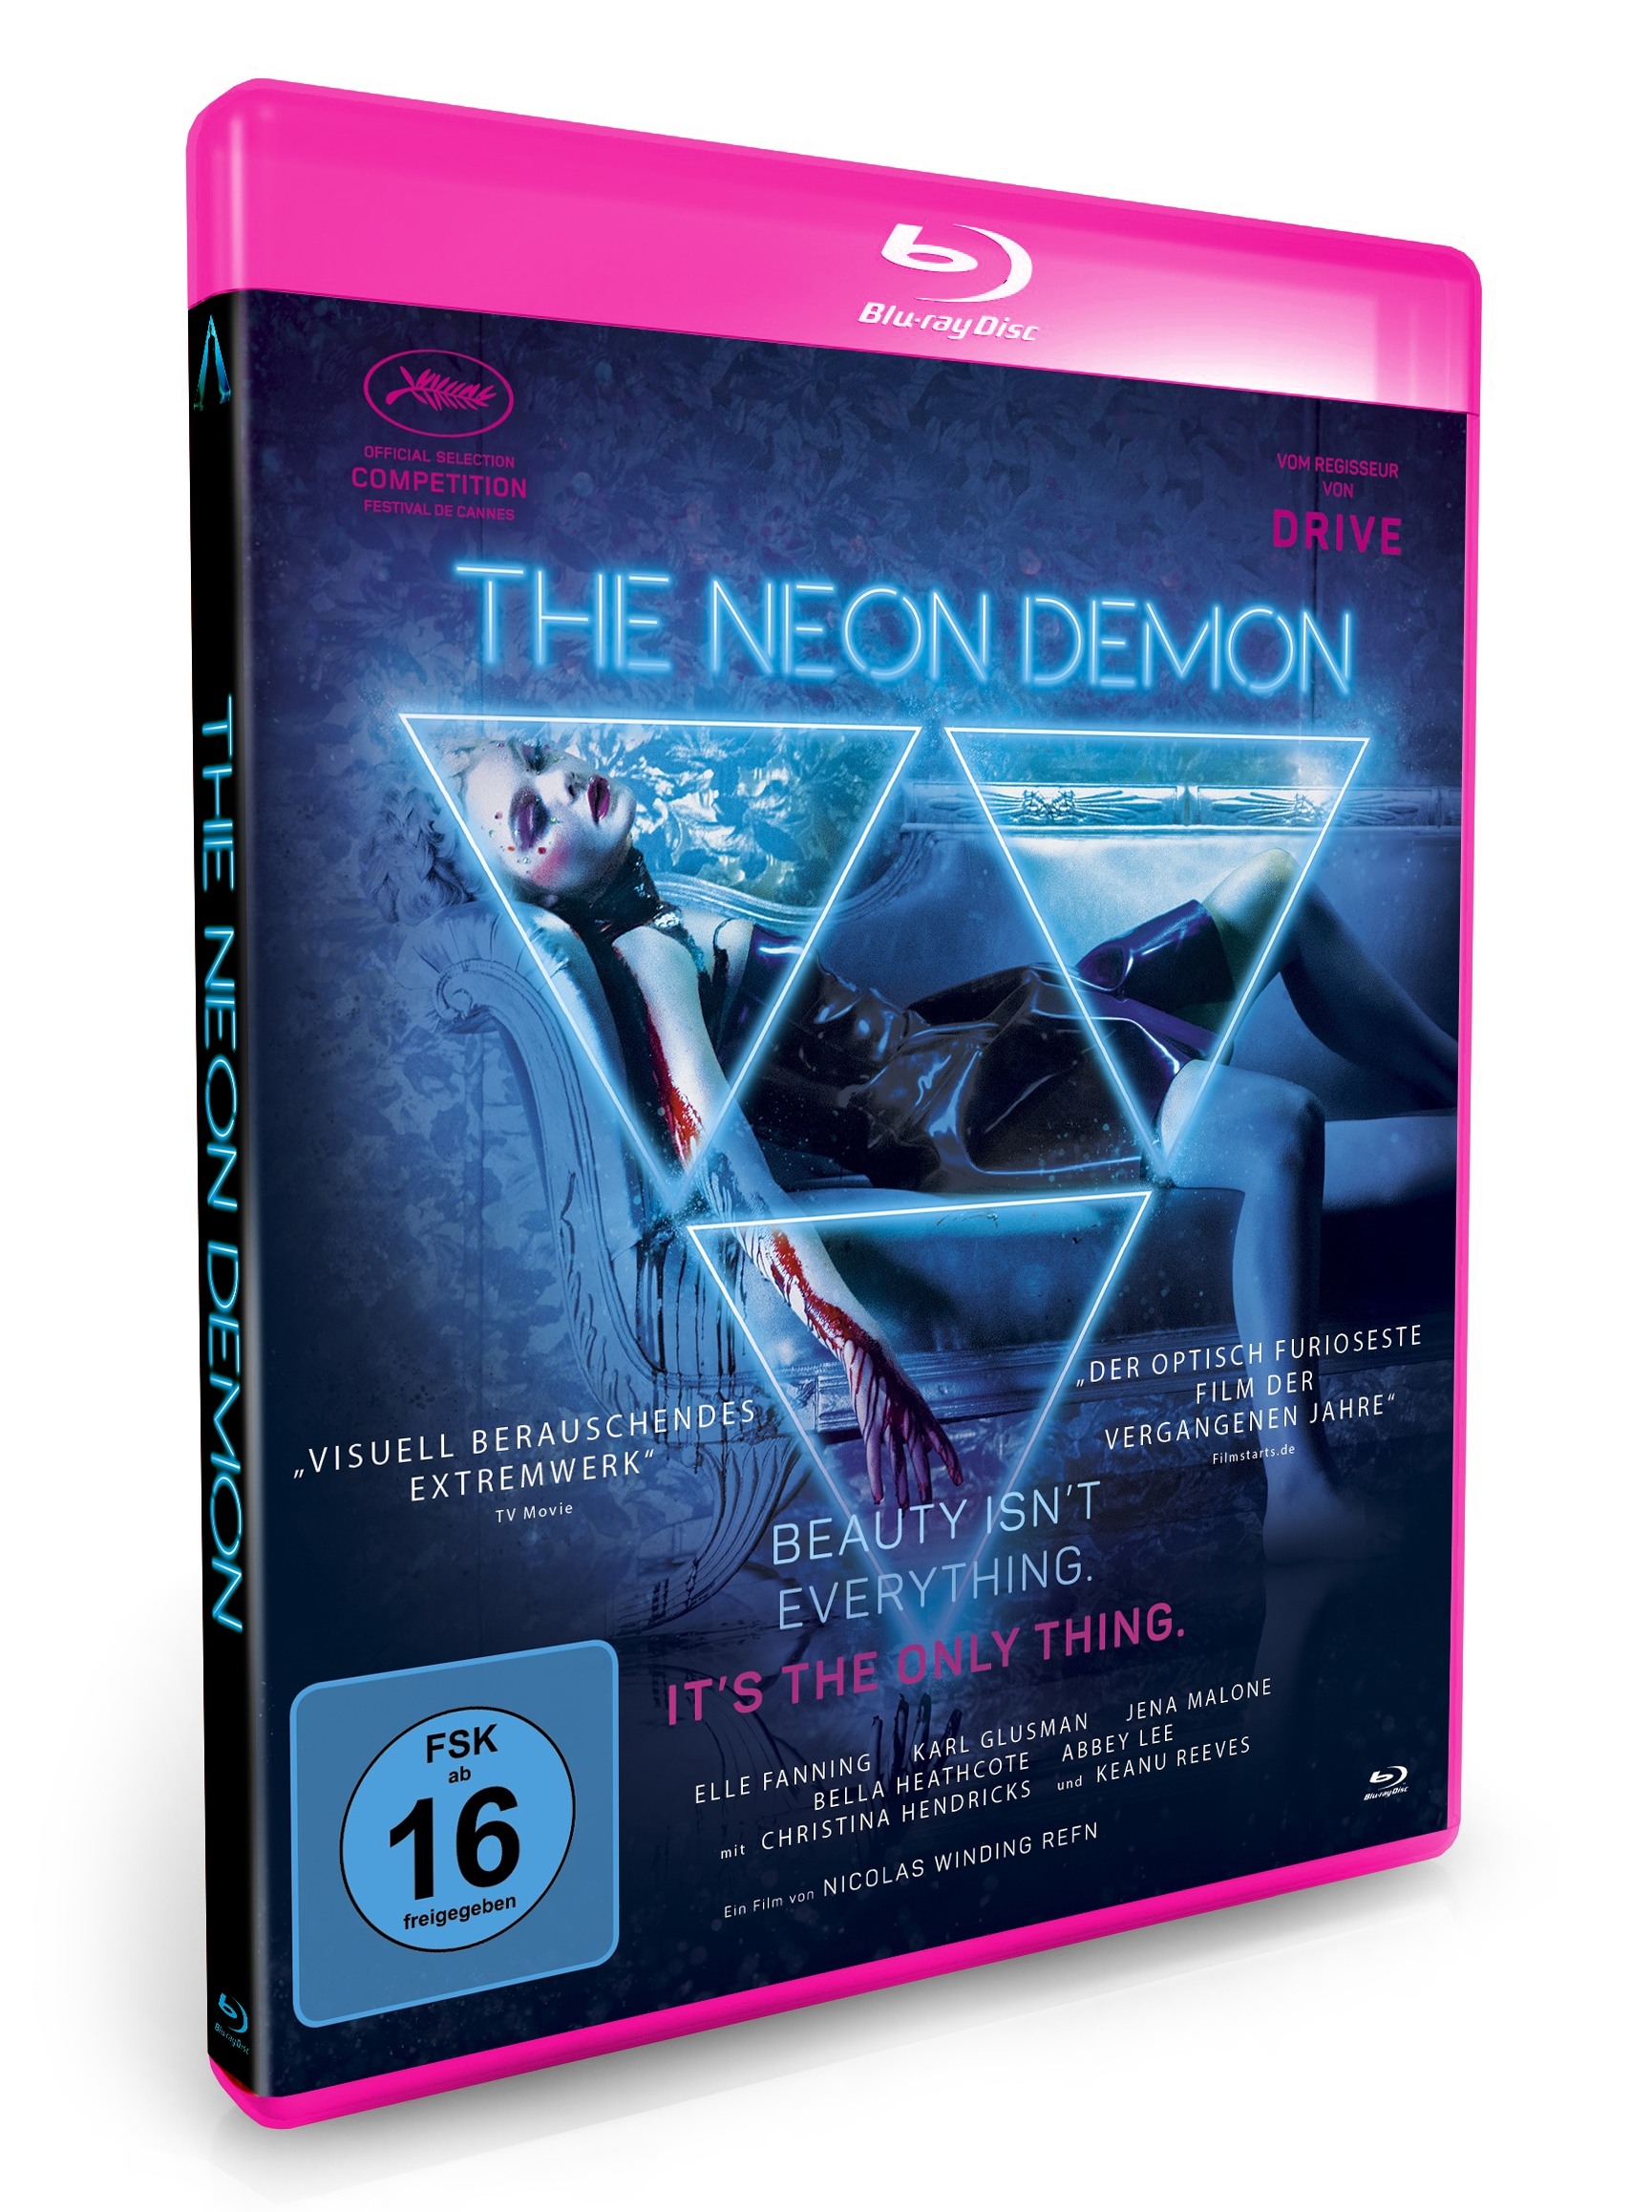 The Neon Demon BluRay